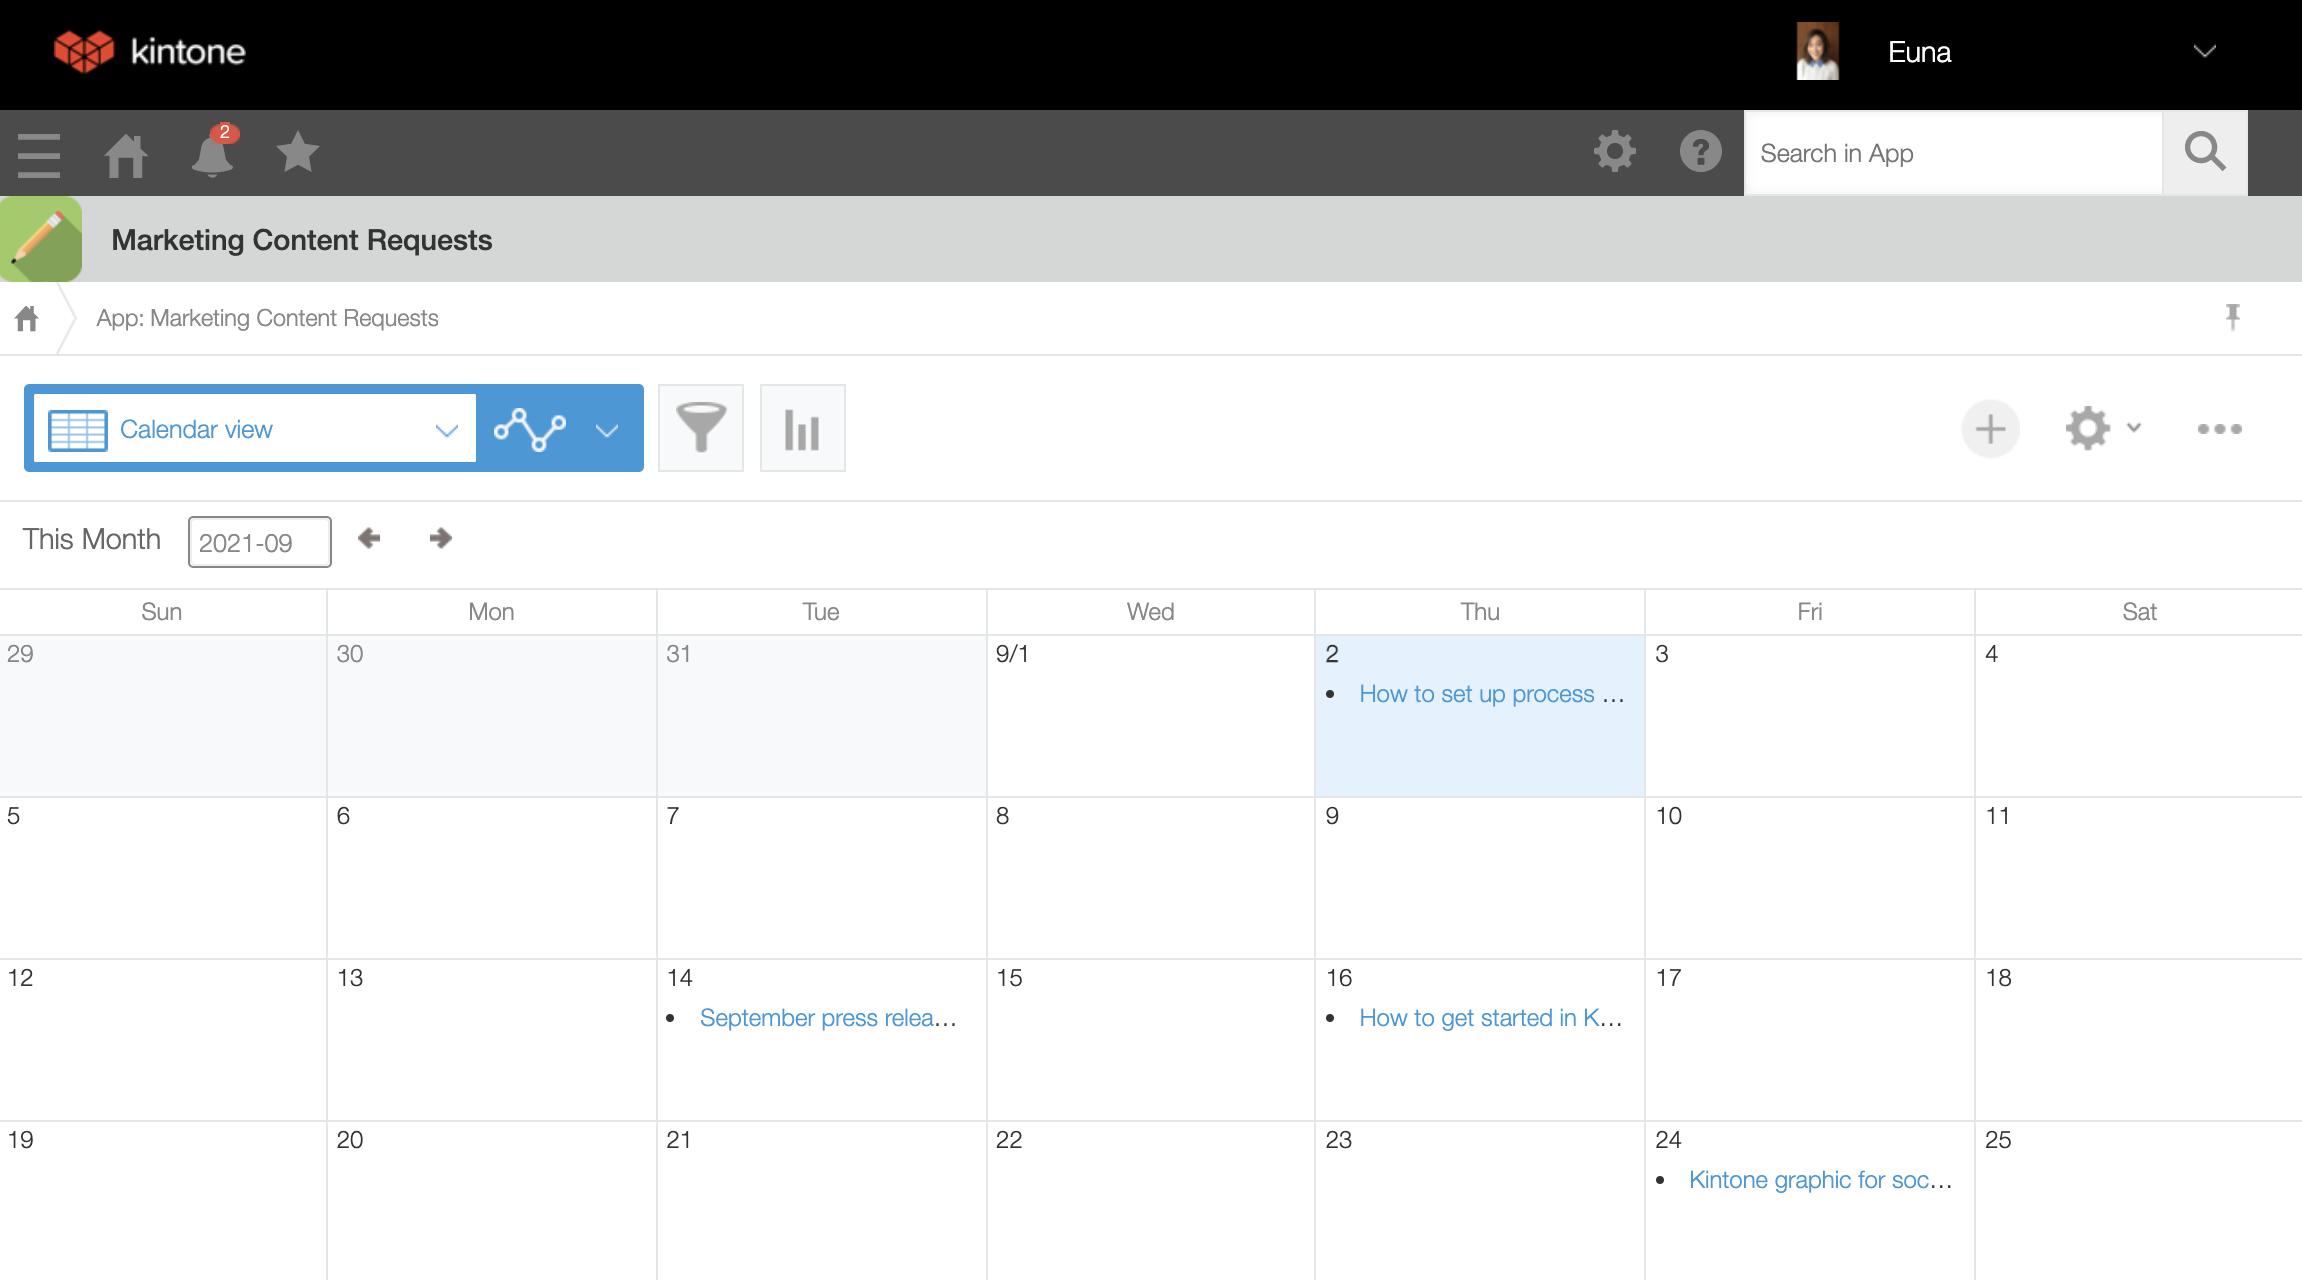 Content request - calendar view